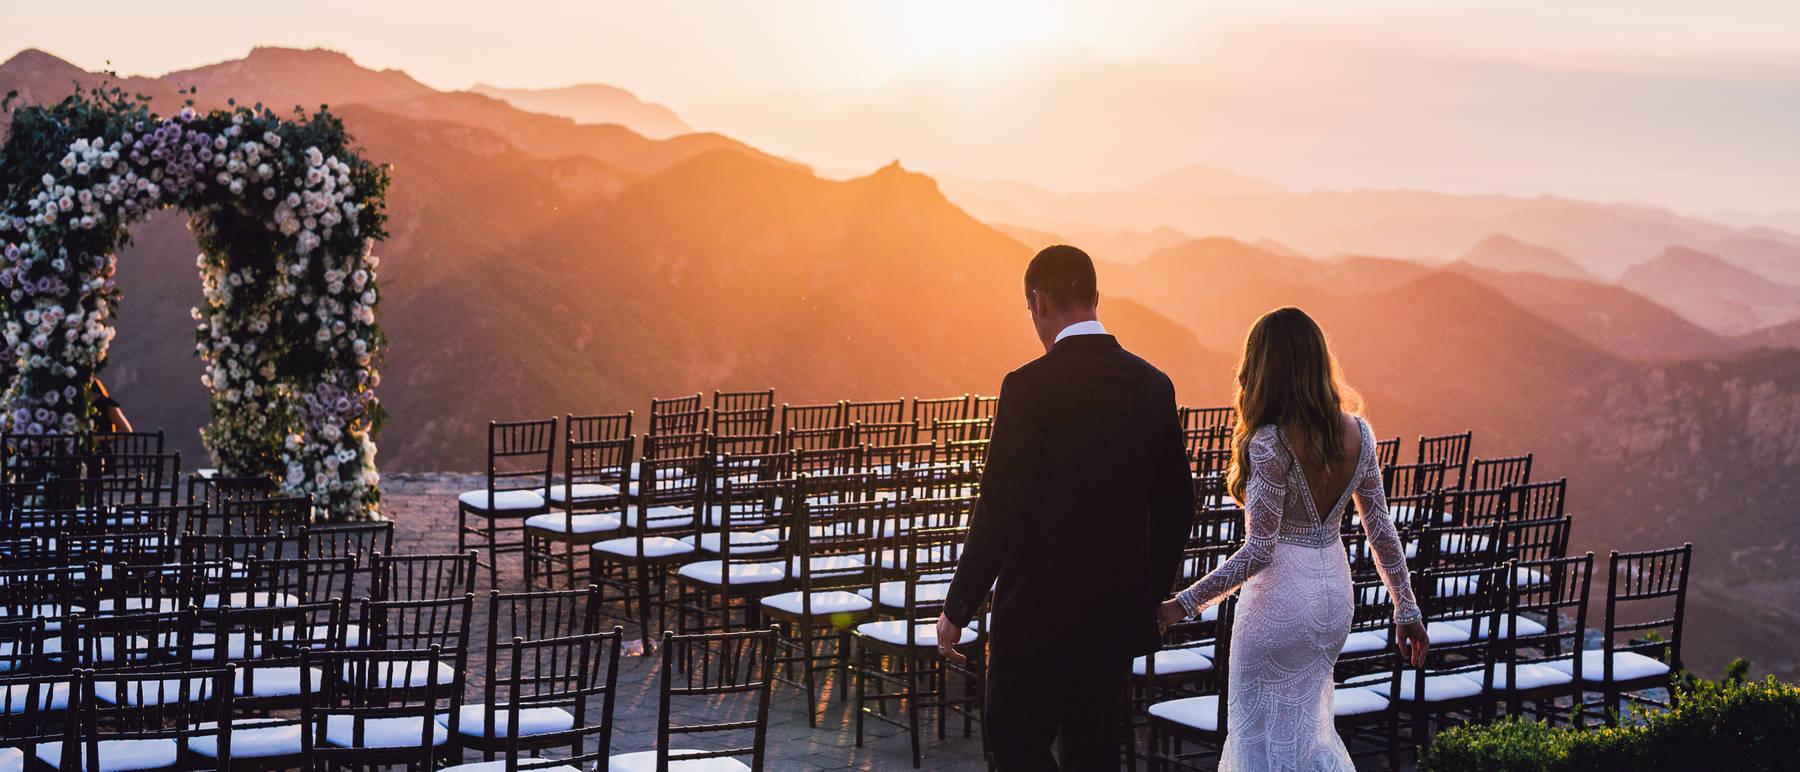 johnandjoseph-wedding-photographer-hz-slider-185